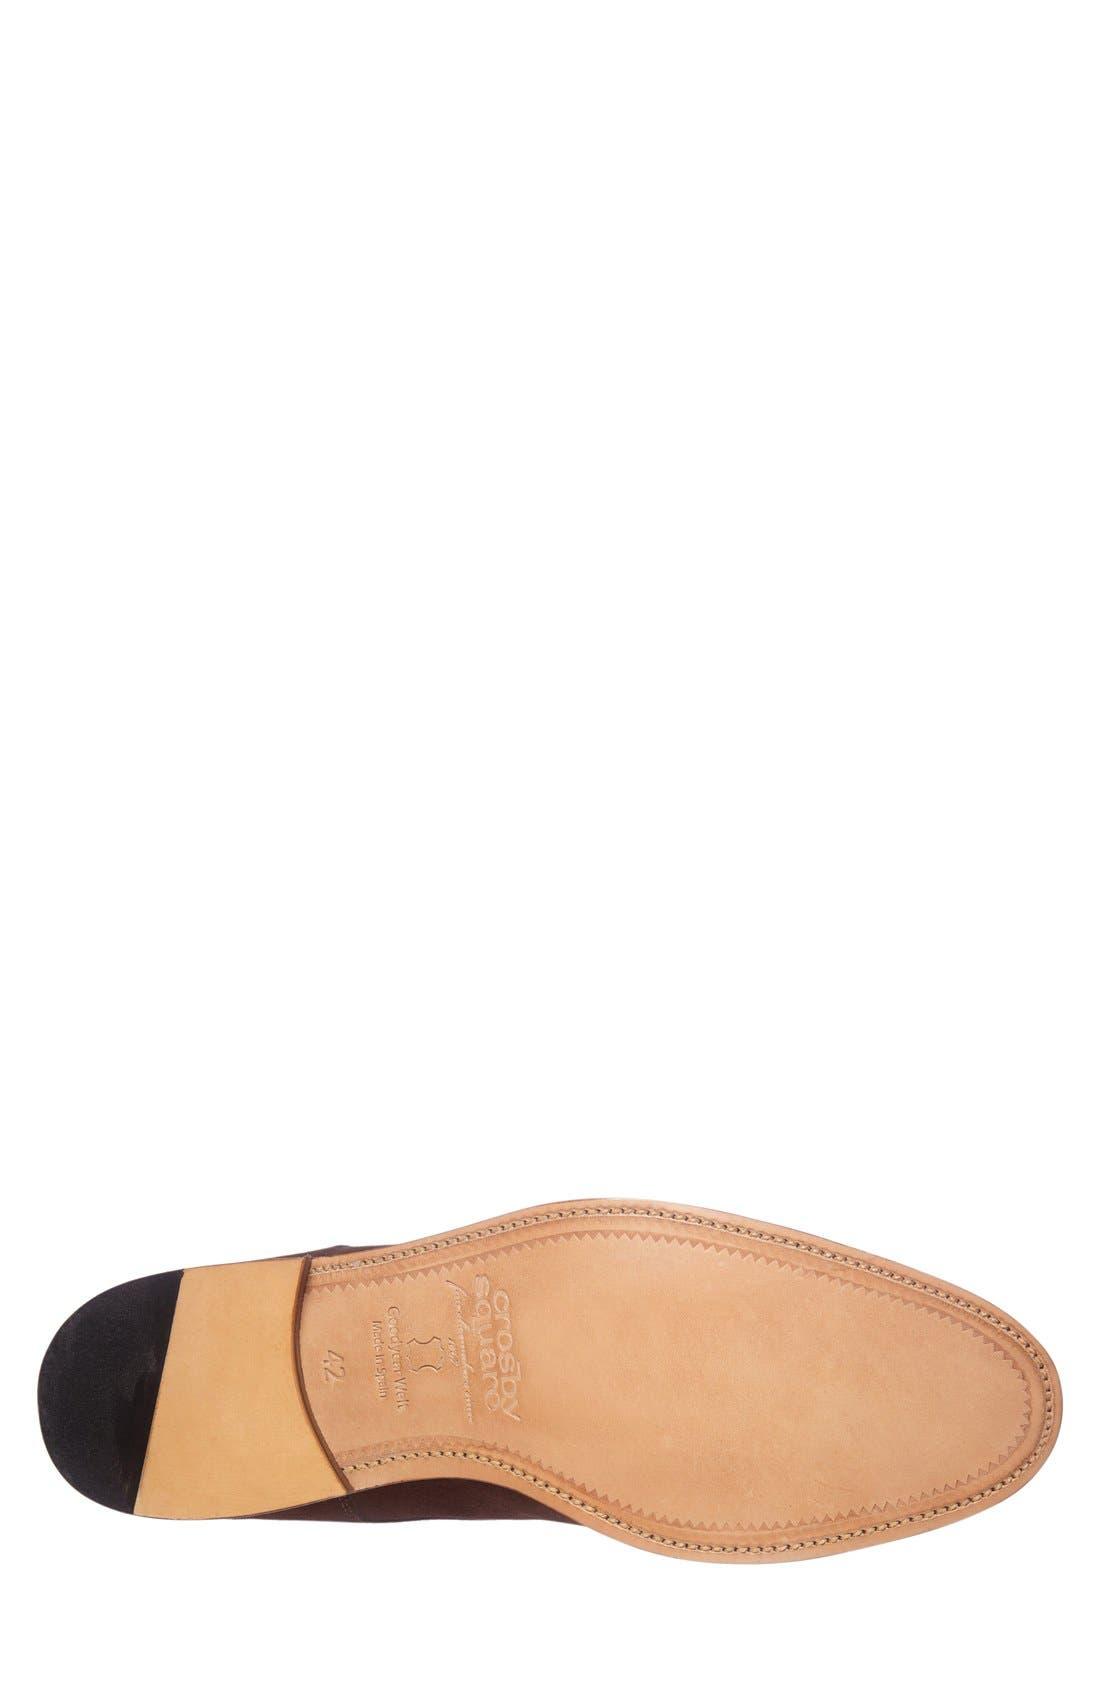 Alternate Image 4  - Crosby Square 'Diplomat' Double Monk Strap Shoe (Men)